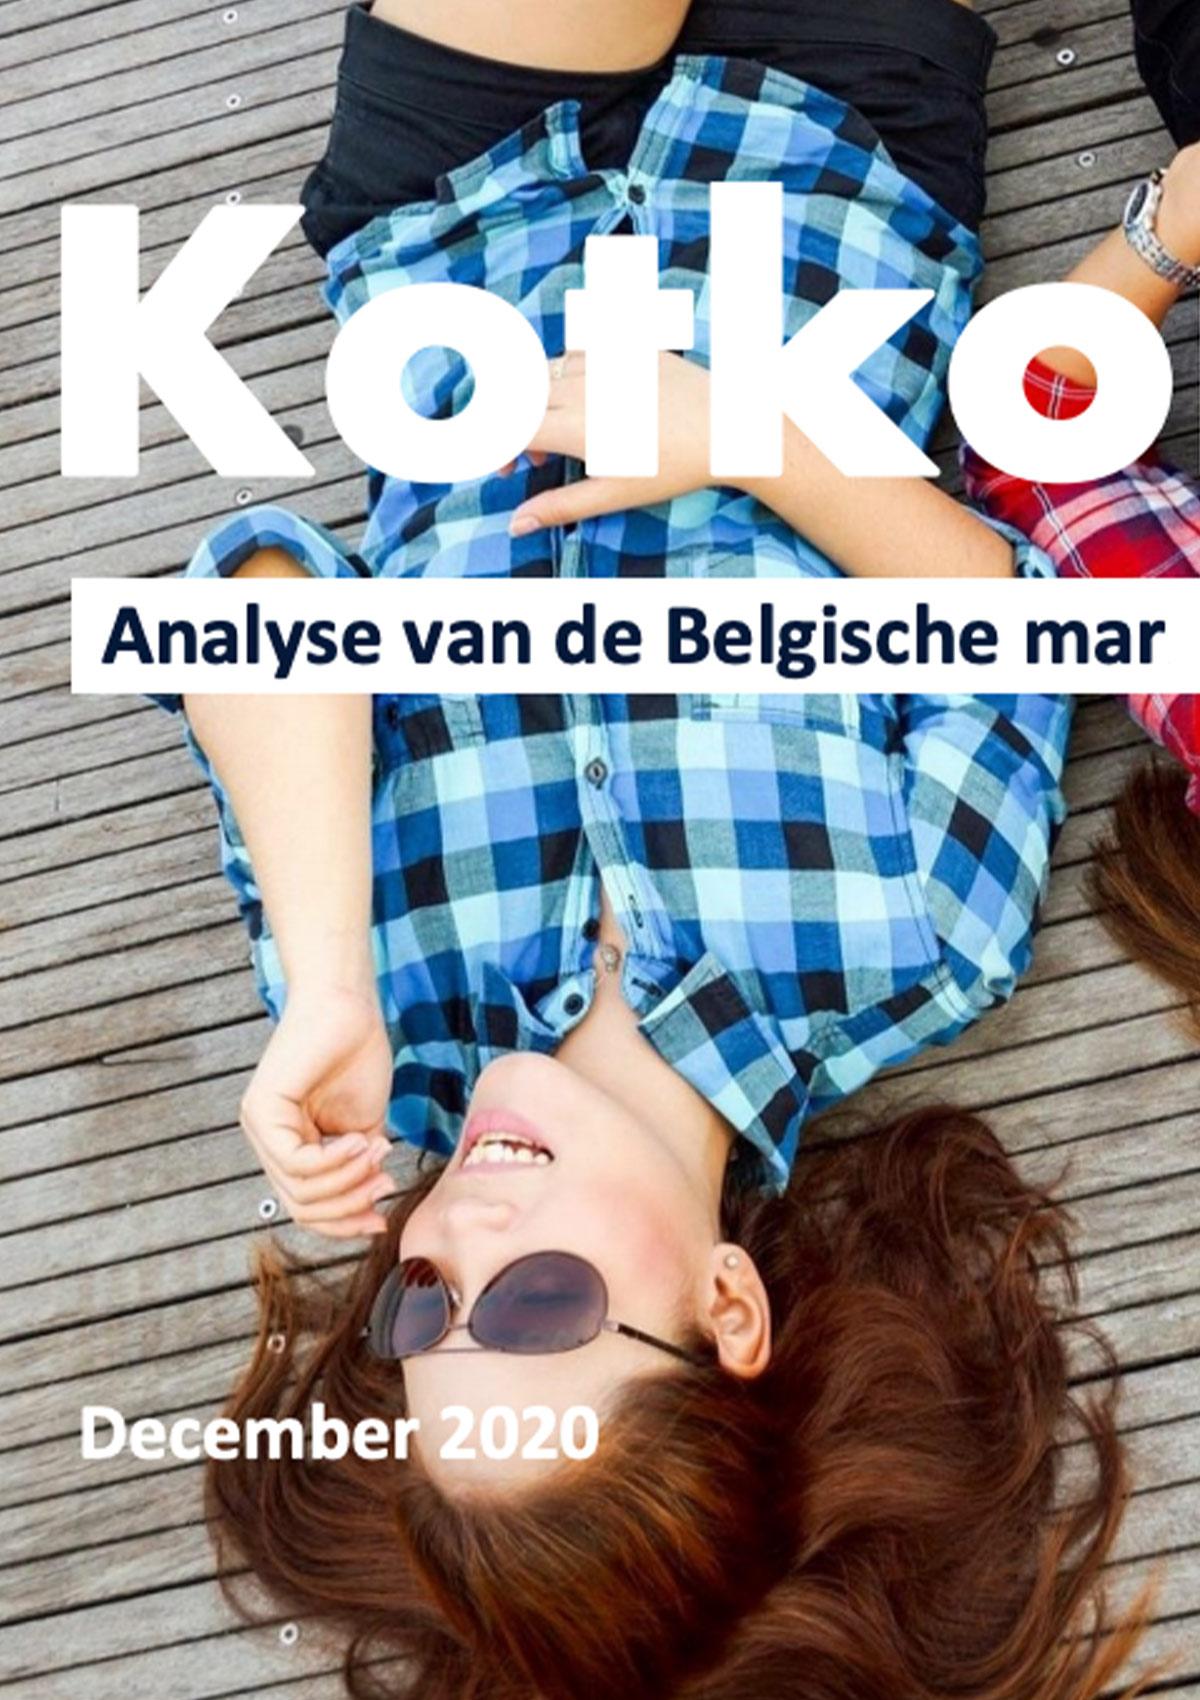 Kotkompas - Belgian Student Housing Market